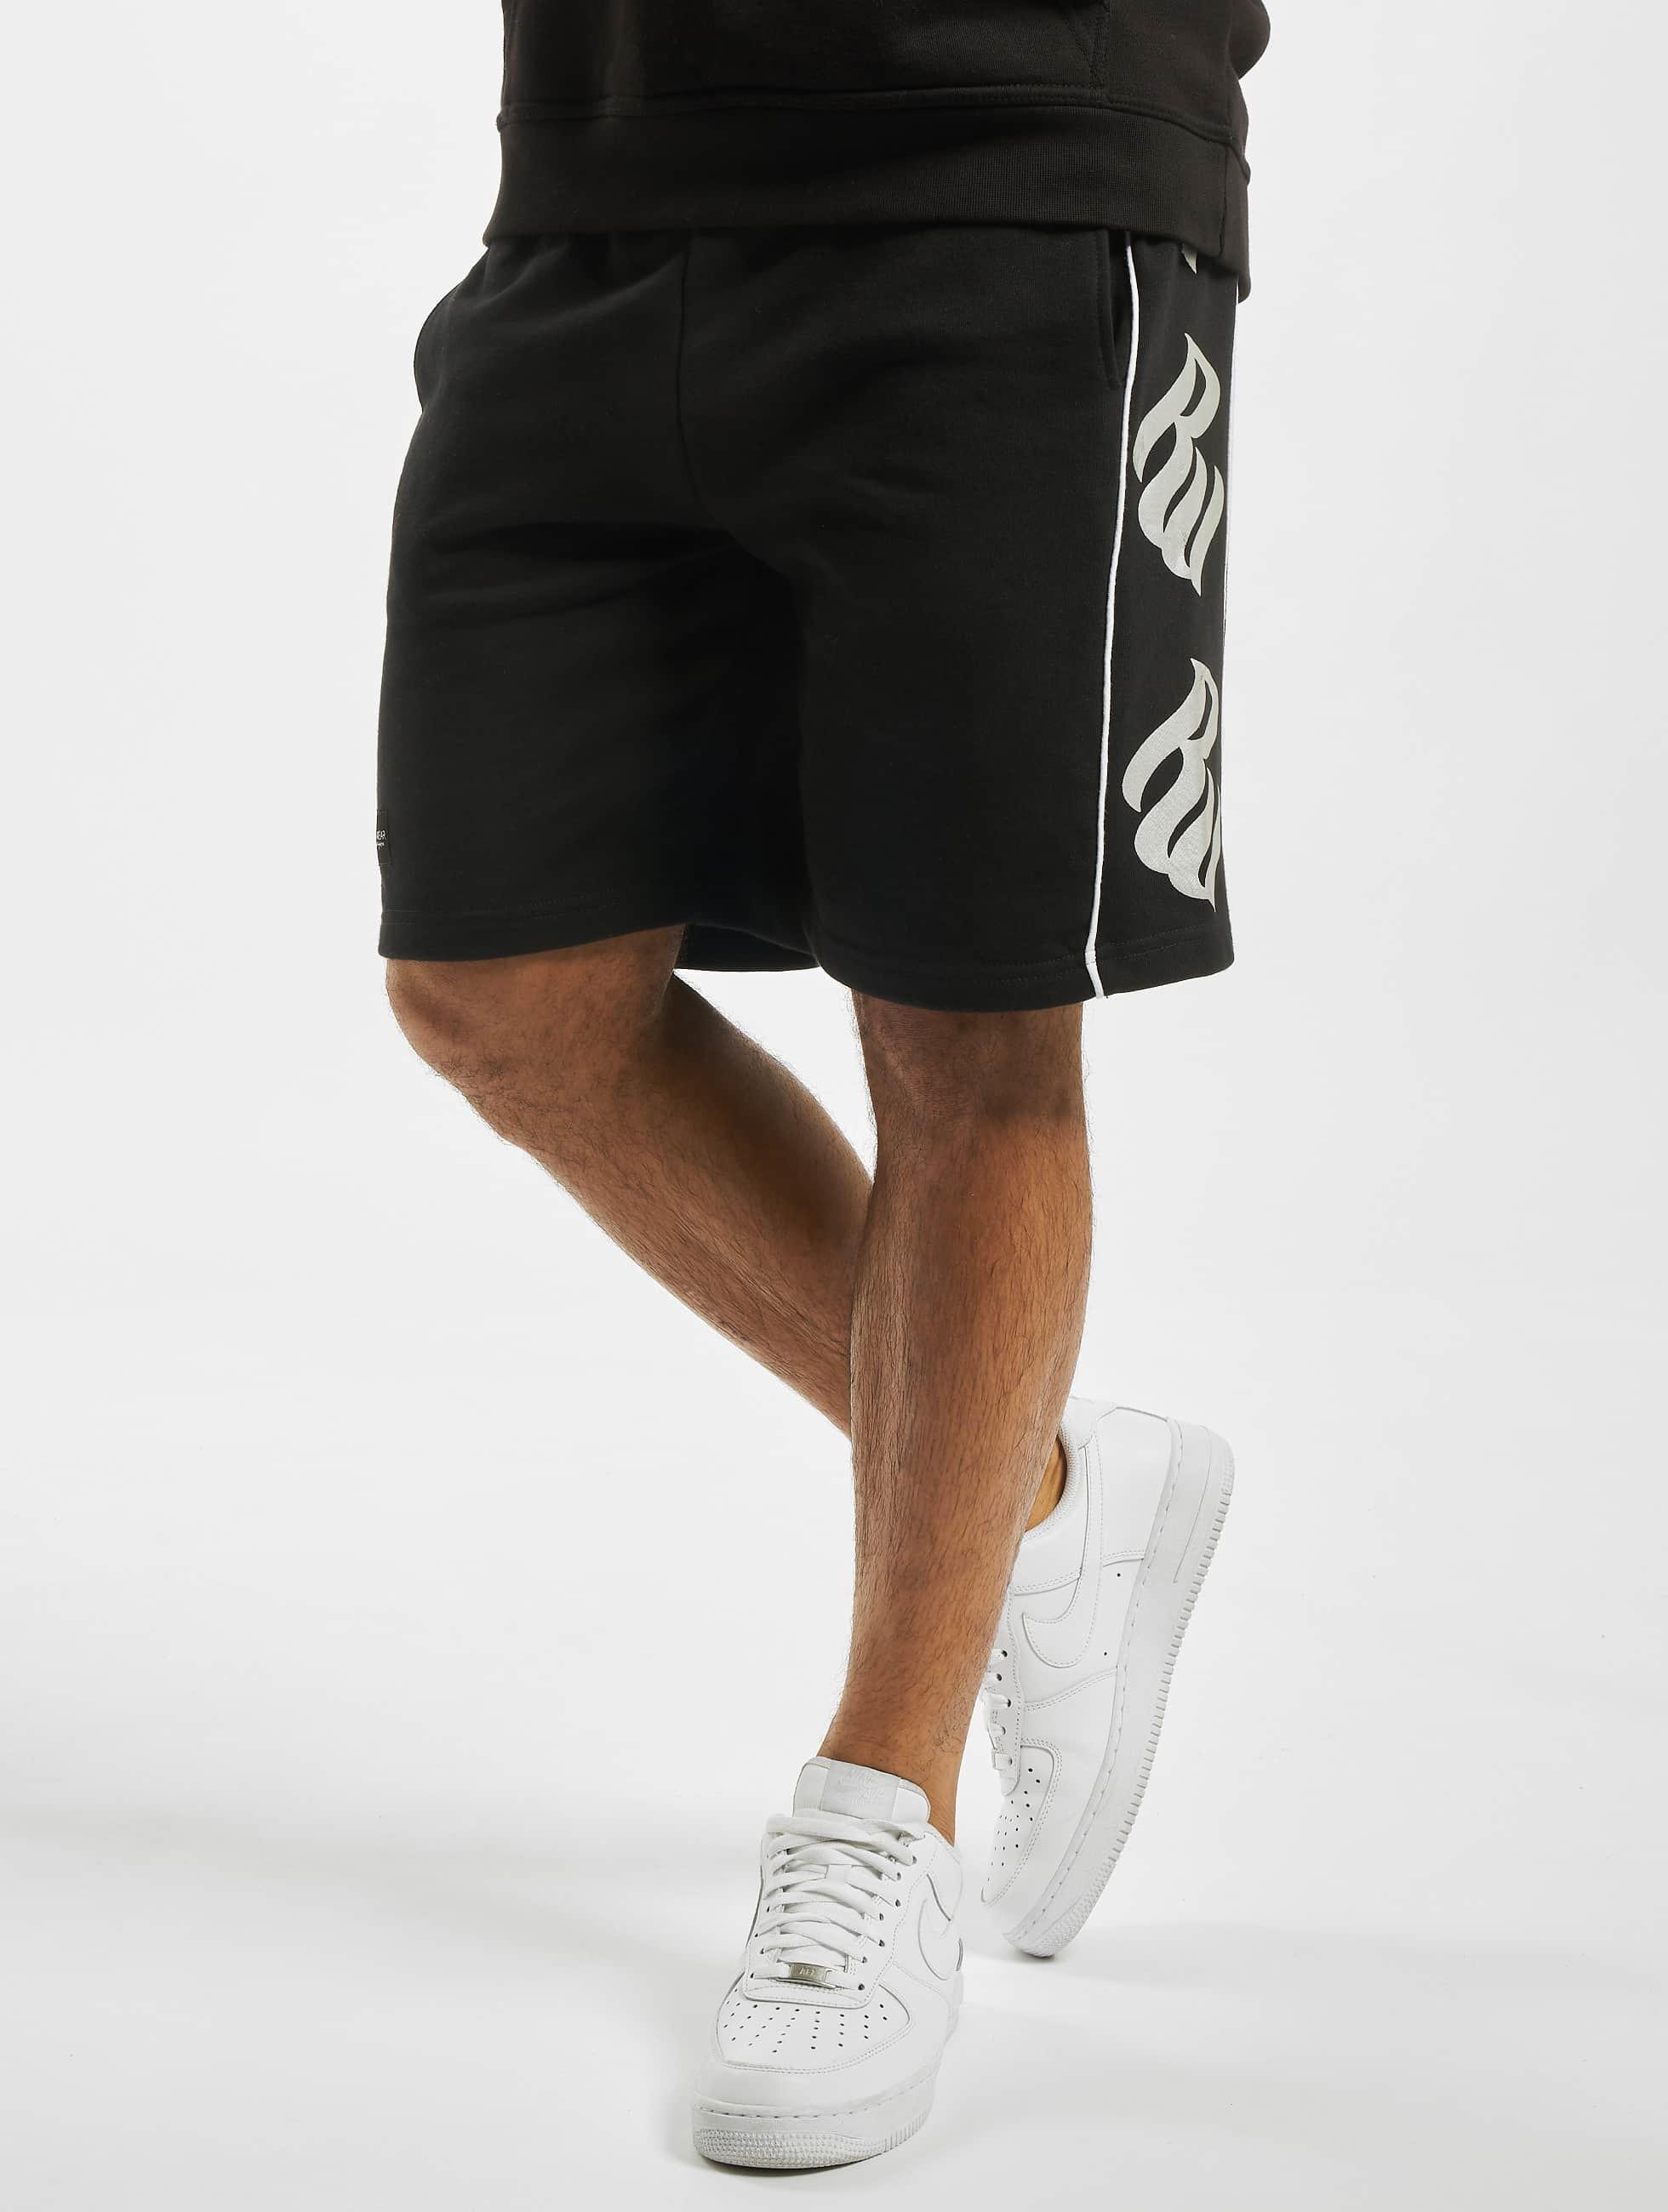 Rocawear / Short Hudson in black 2XL